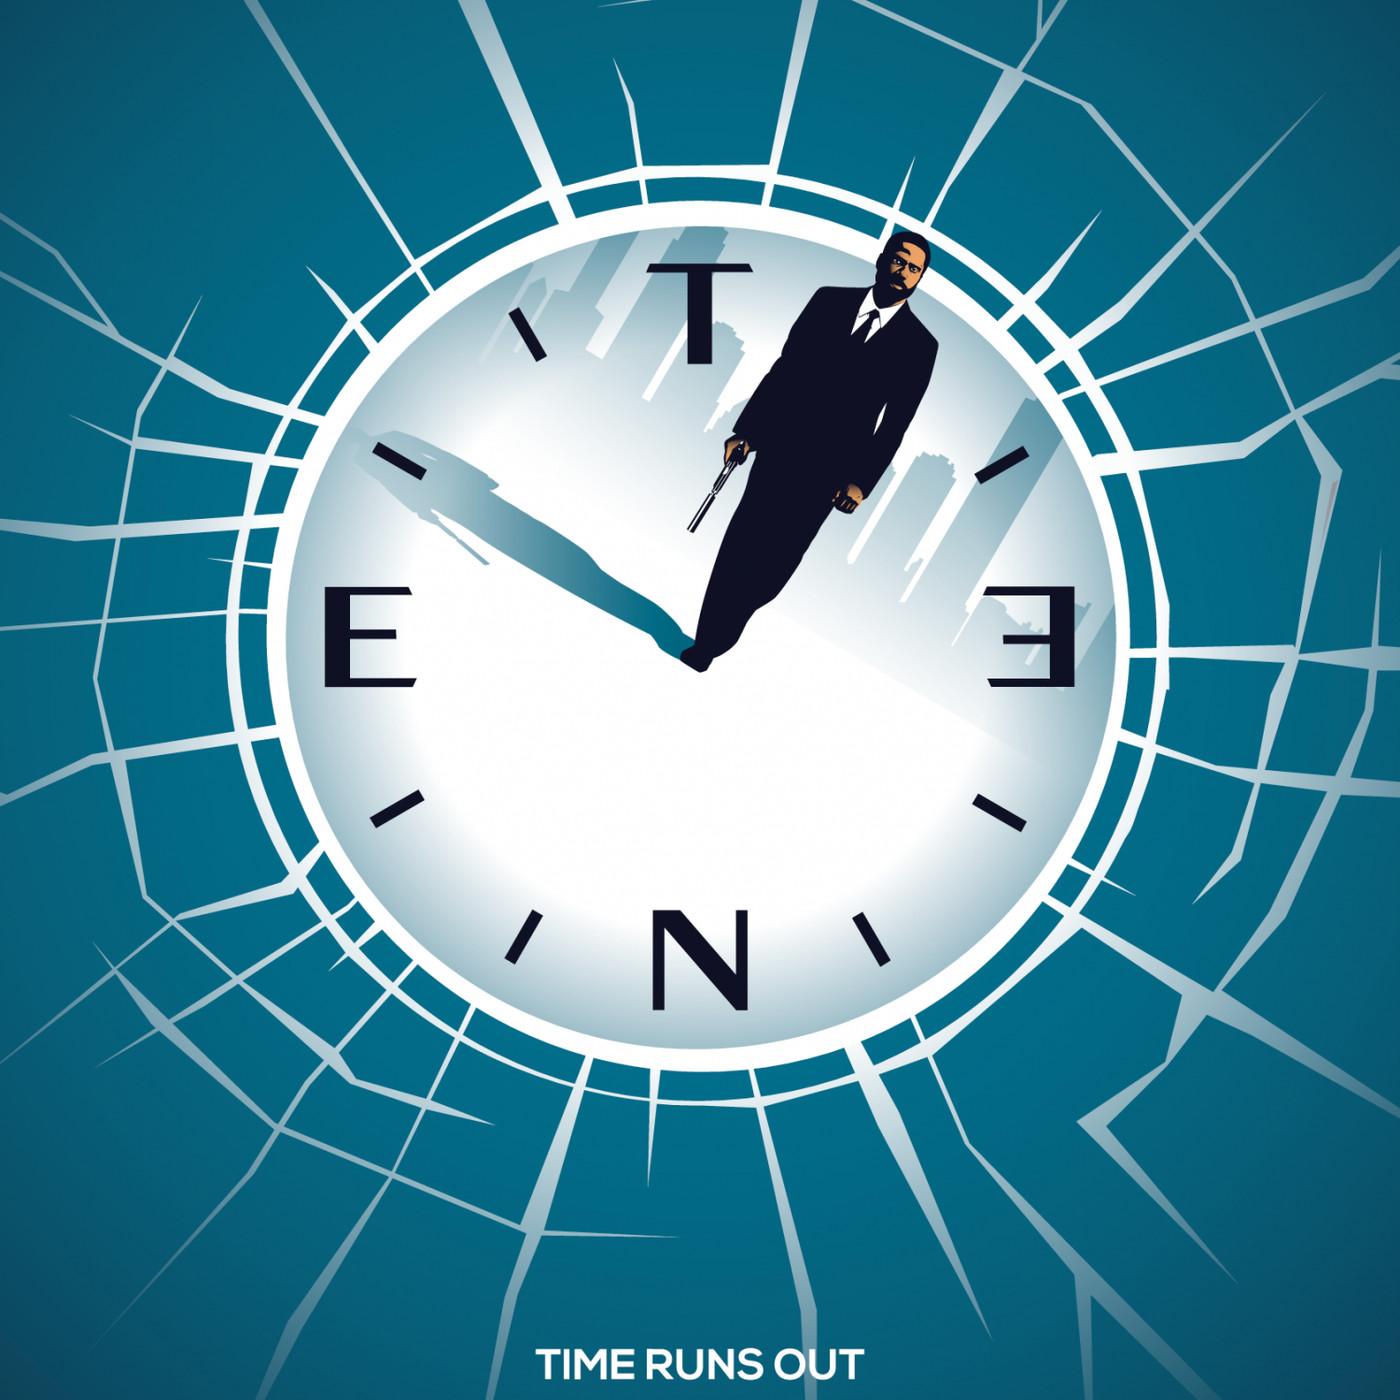 TENET de Christopher Nolan: ¡Volvemos al cine!